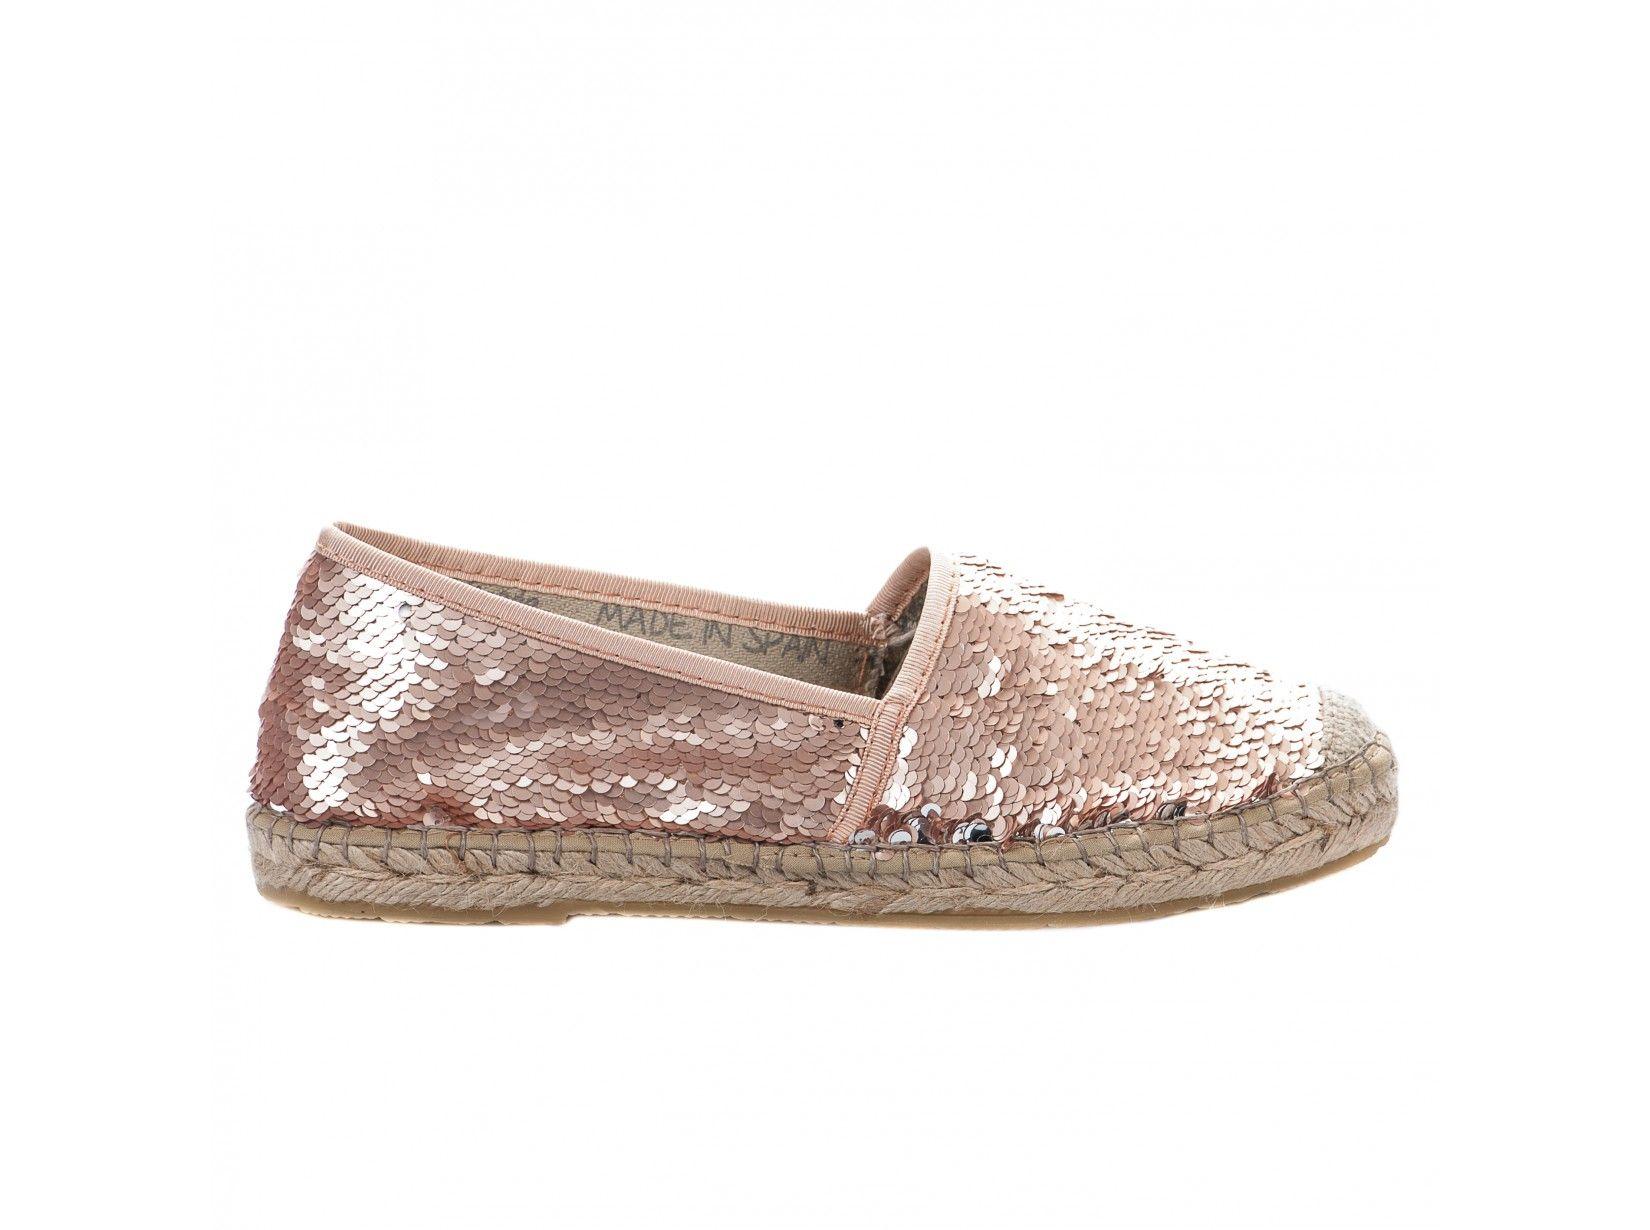 MarqueChaussureEt MarqueChaussureEt Chaussures Chaussures Chaussures De De MarqueChaussureEt Chaussures MarqueChaussureEt Chaussures De De SLzMqVpGU